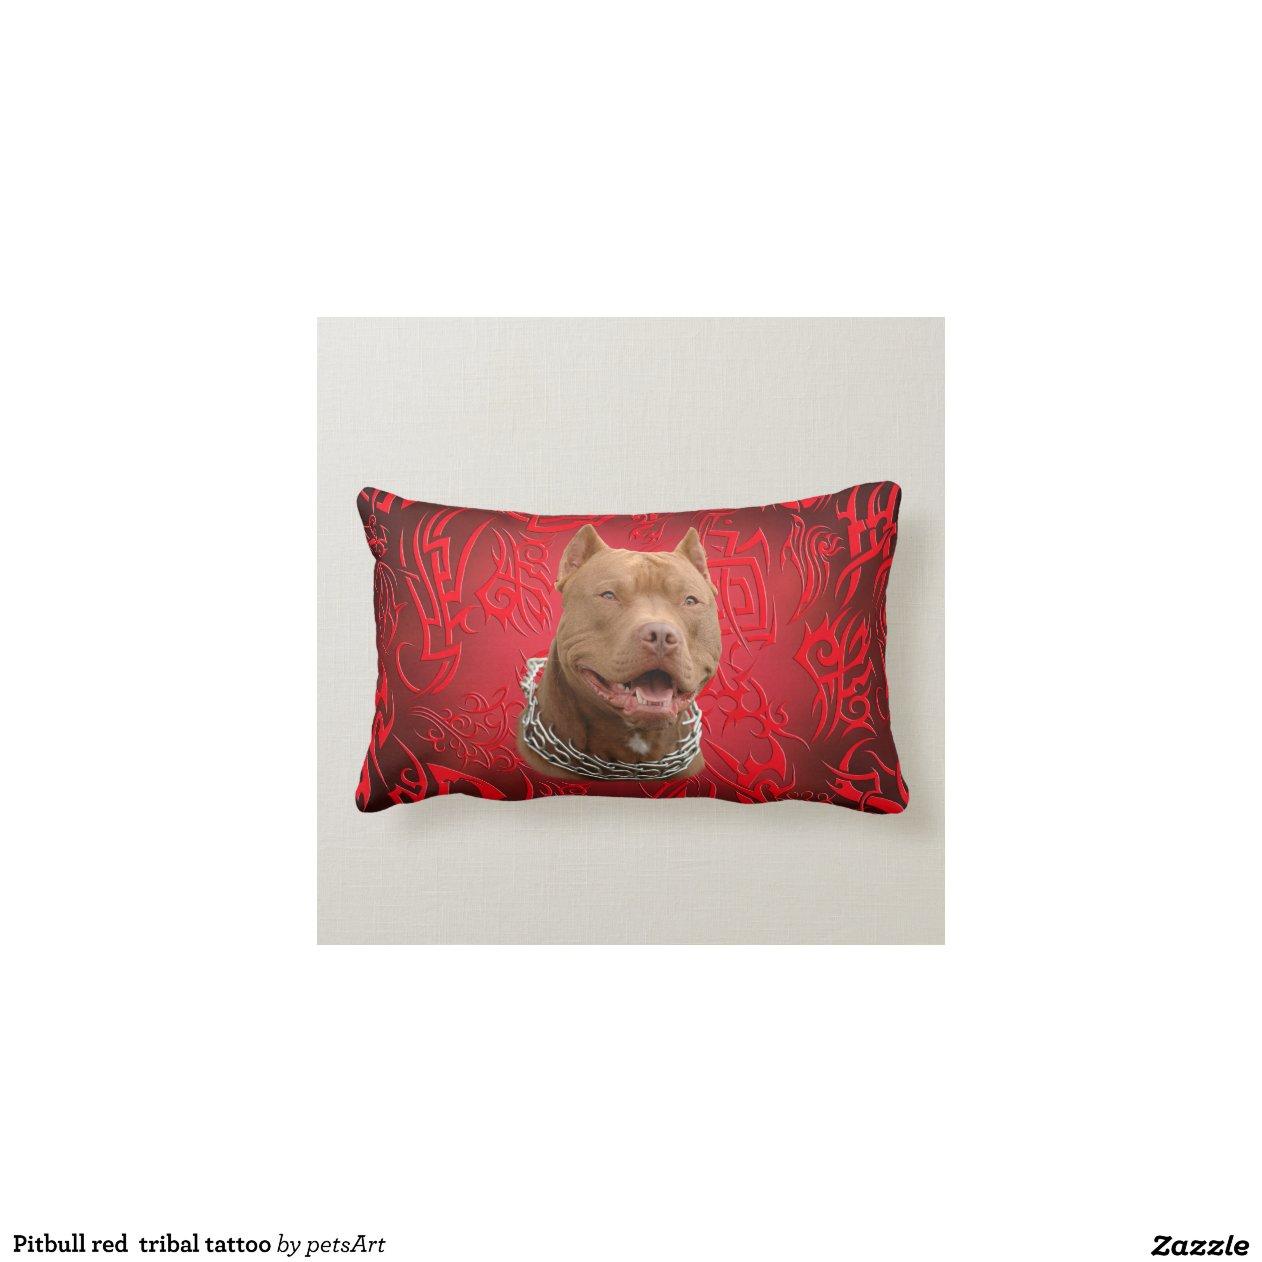 Pitbull red tribal tattoo throw pillow Zazzle